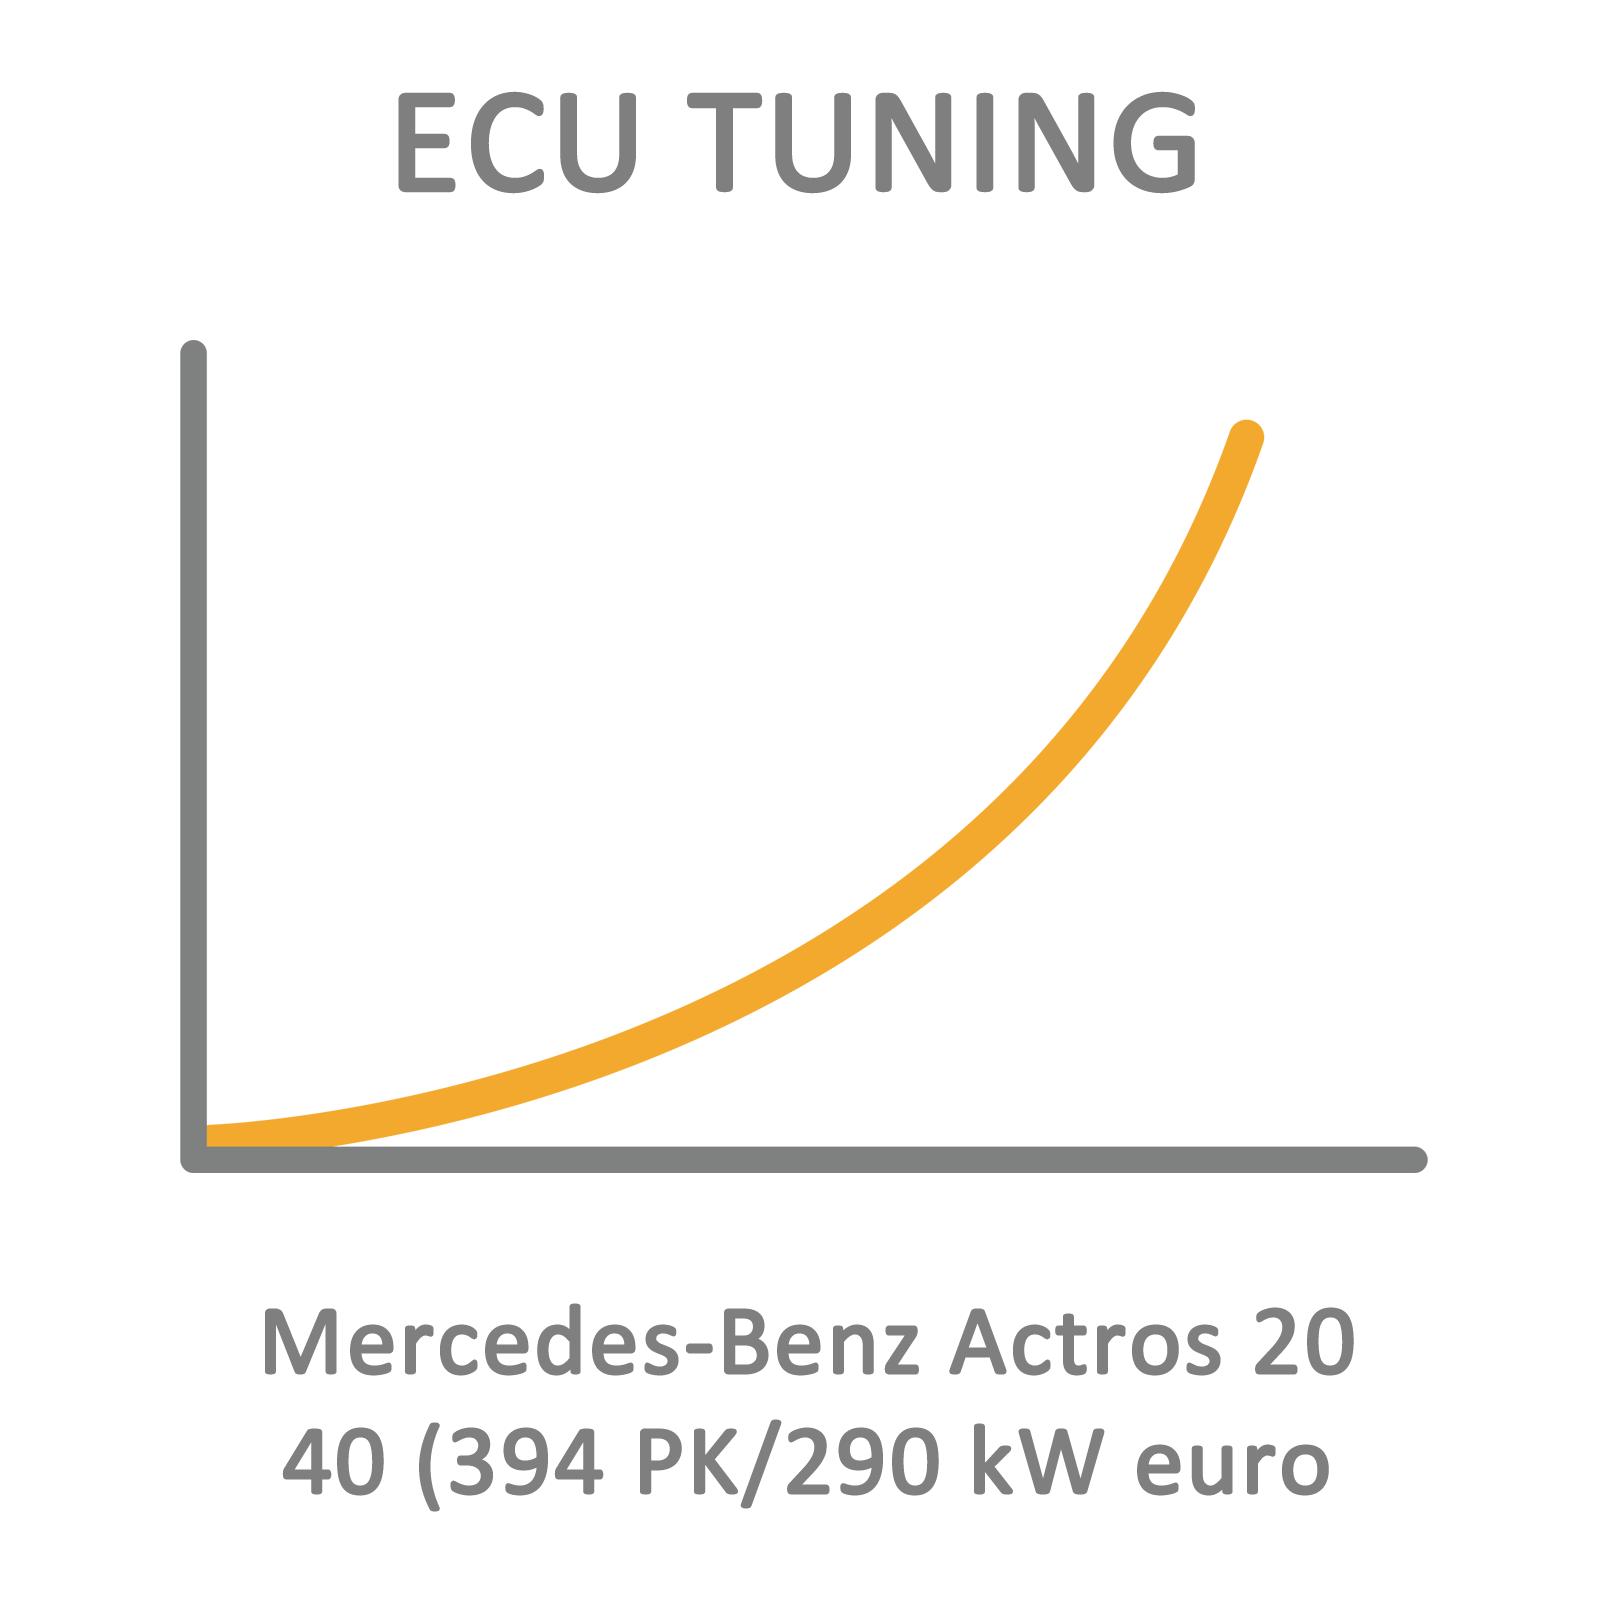 Mercedes-Benz Actros 20 40 (394 PK/290 kW euro 4+5 ECU